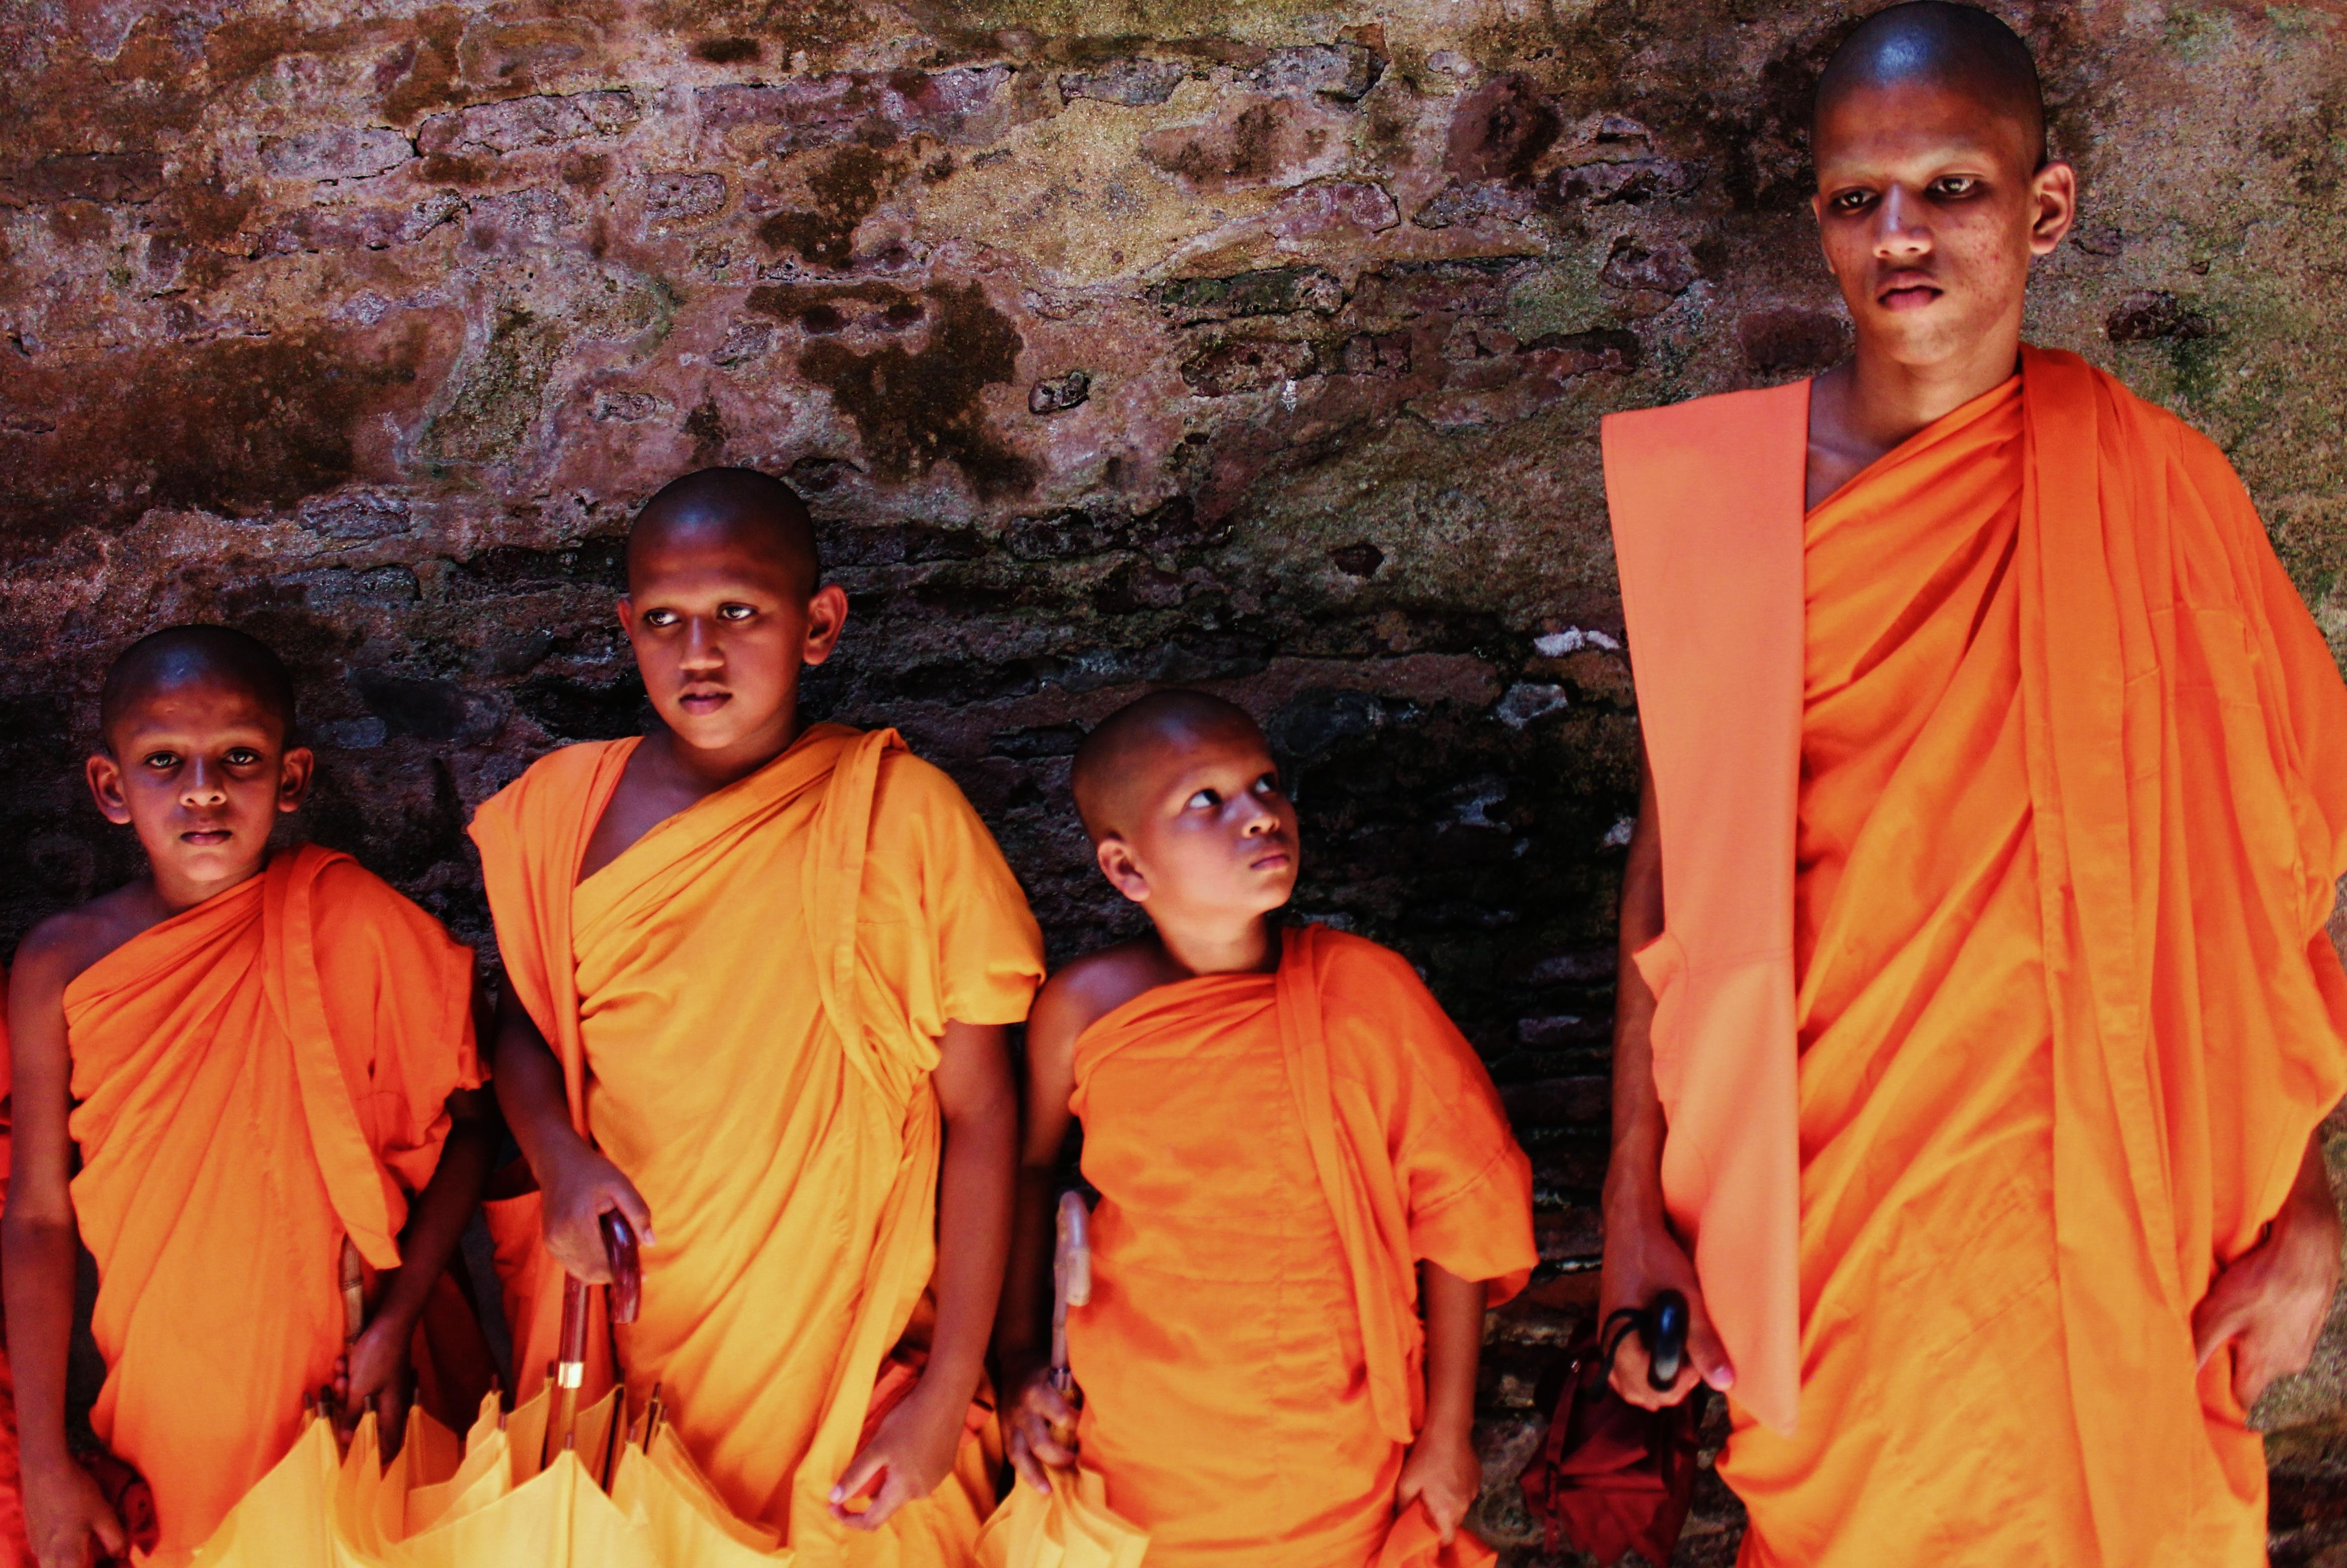 Sri-Lanka-Monks-Buddhism